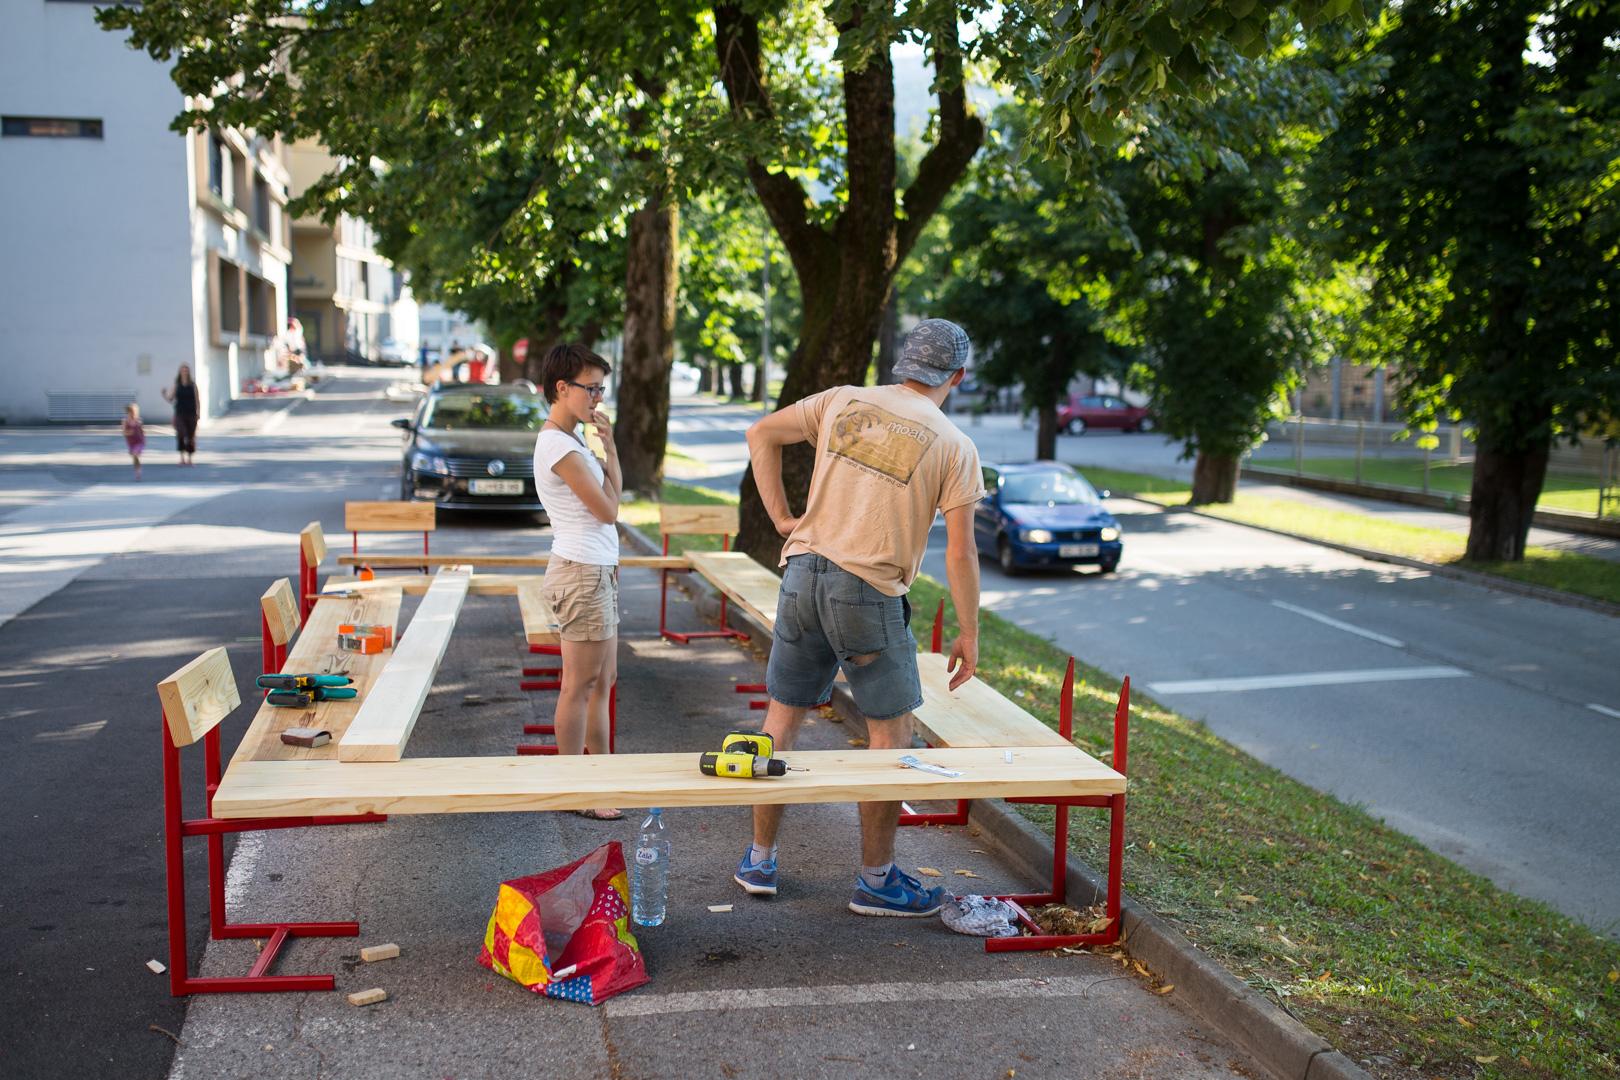 Idrija street furniture project (photo credit: photo Marko Čuk, prostoRož)